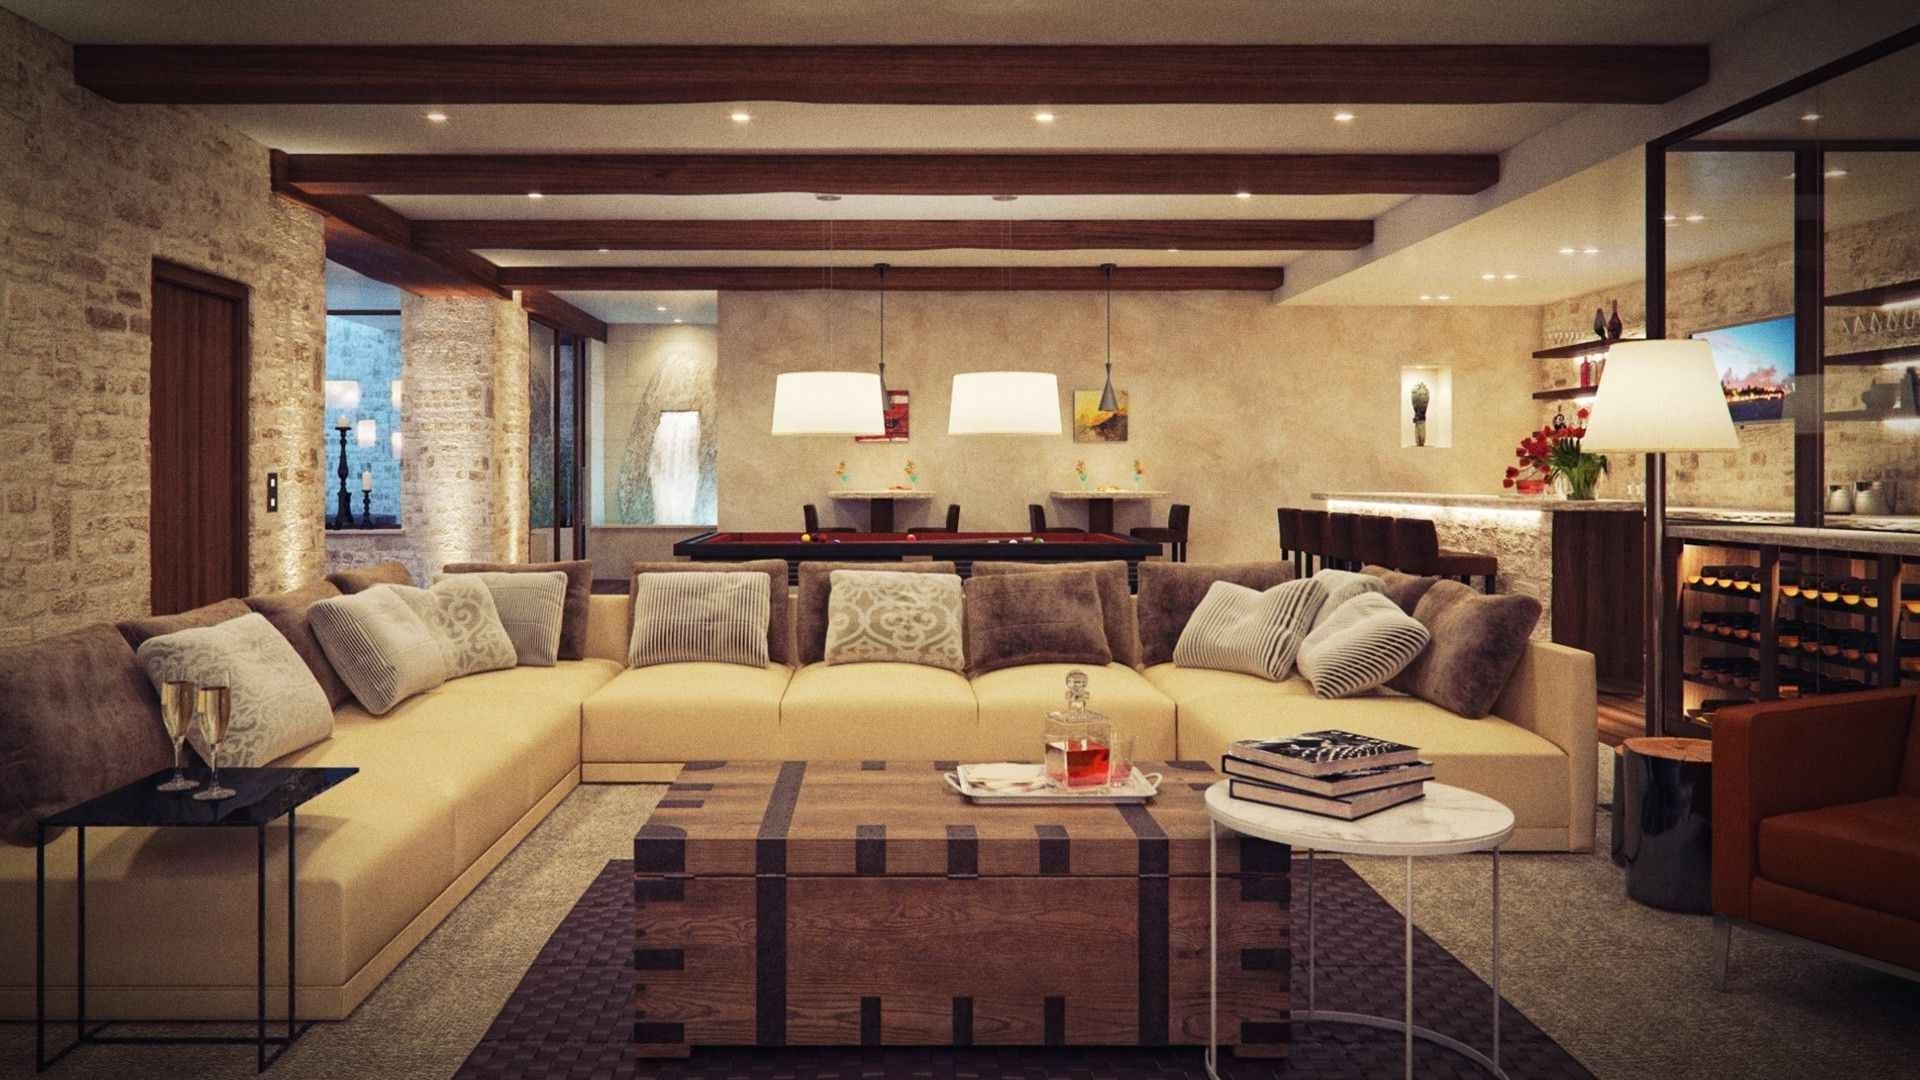 30 Awesome Rustic Italian Living Room Ideas  Italian Living Room Prepossessing Italian Living Room Design 2018